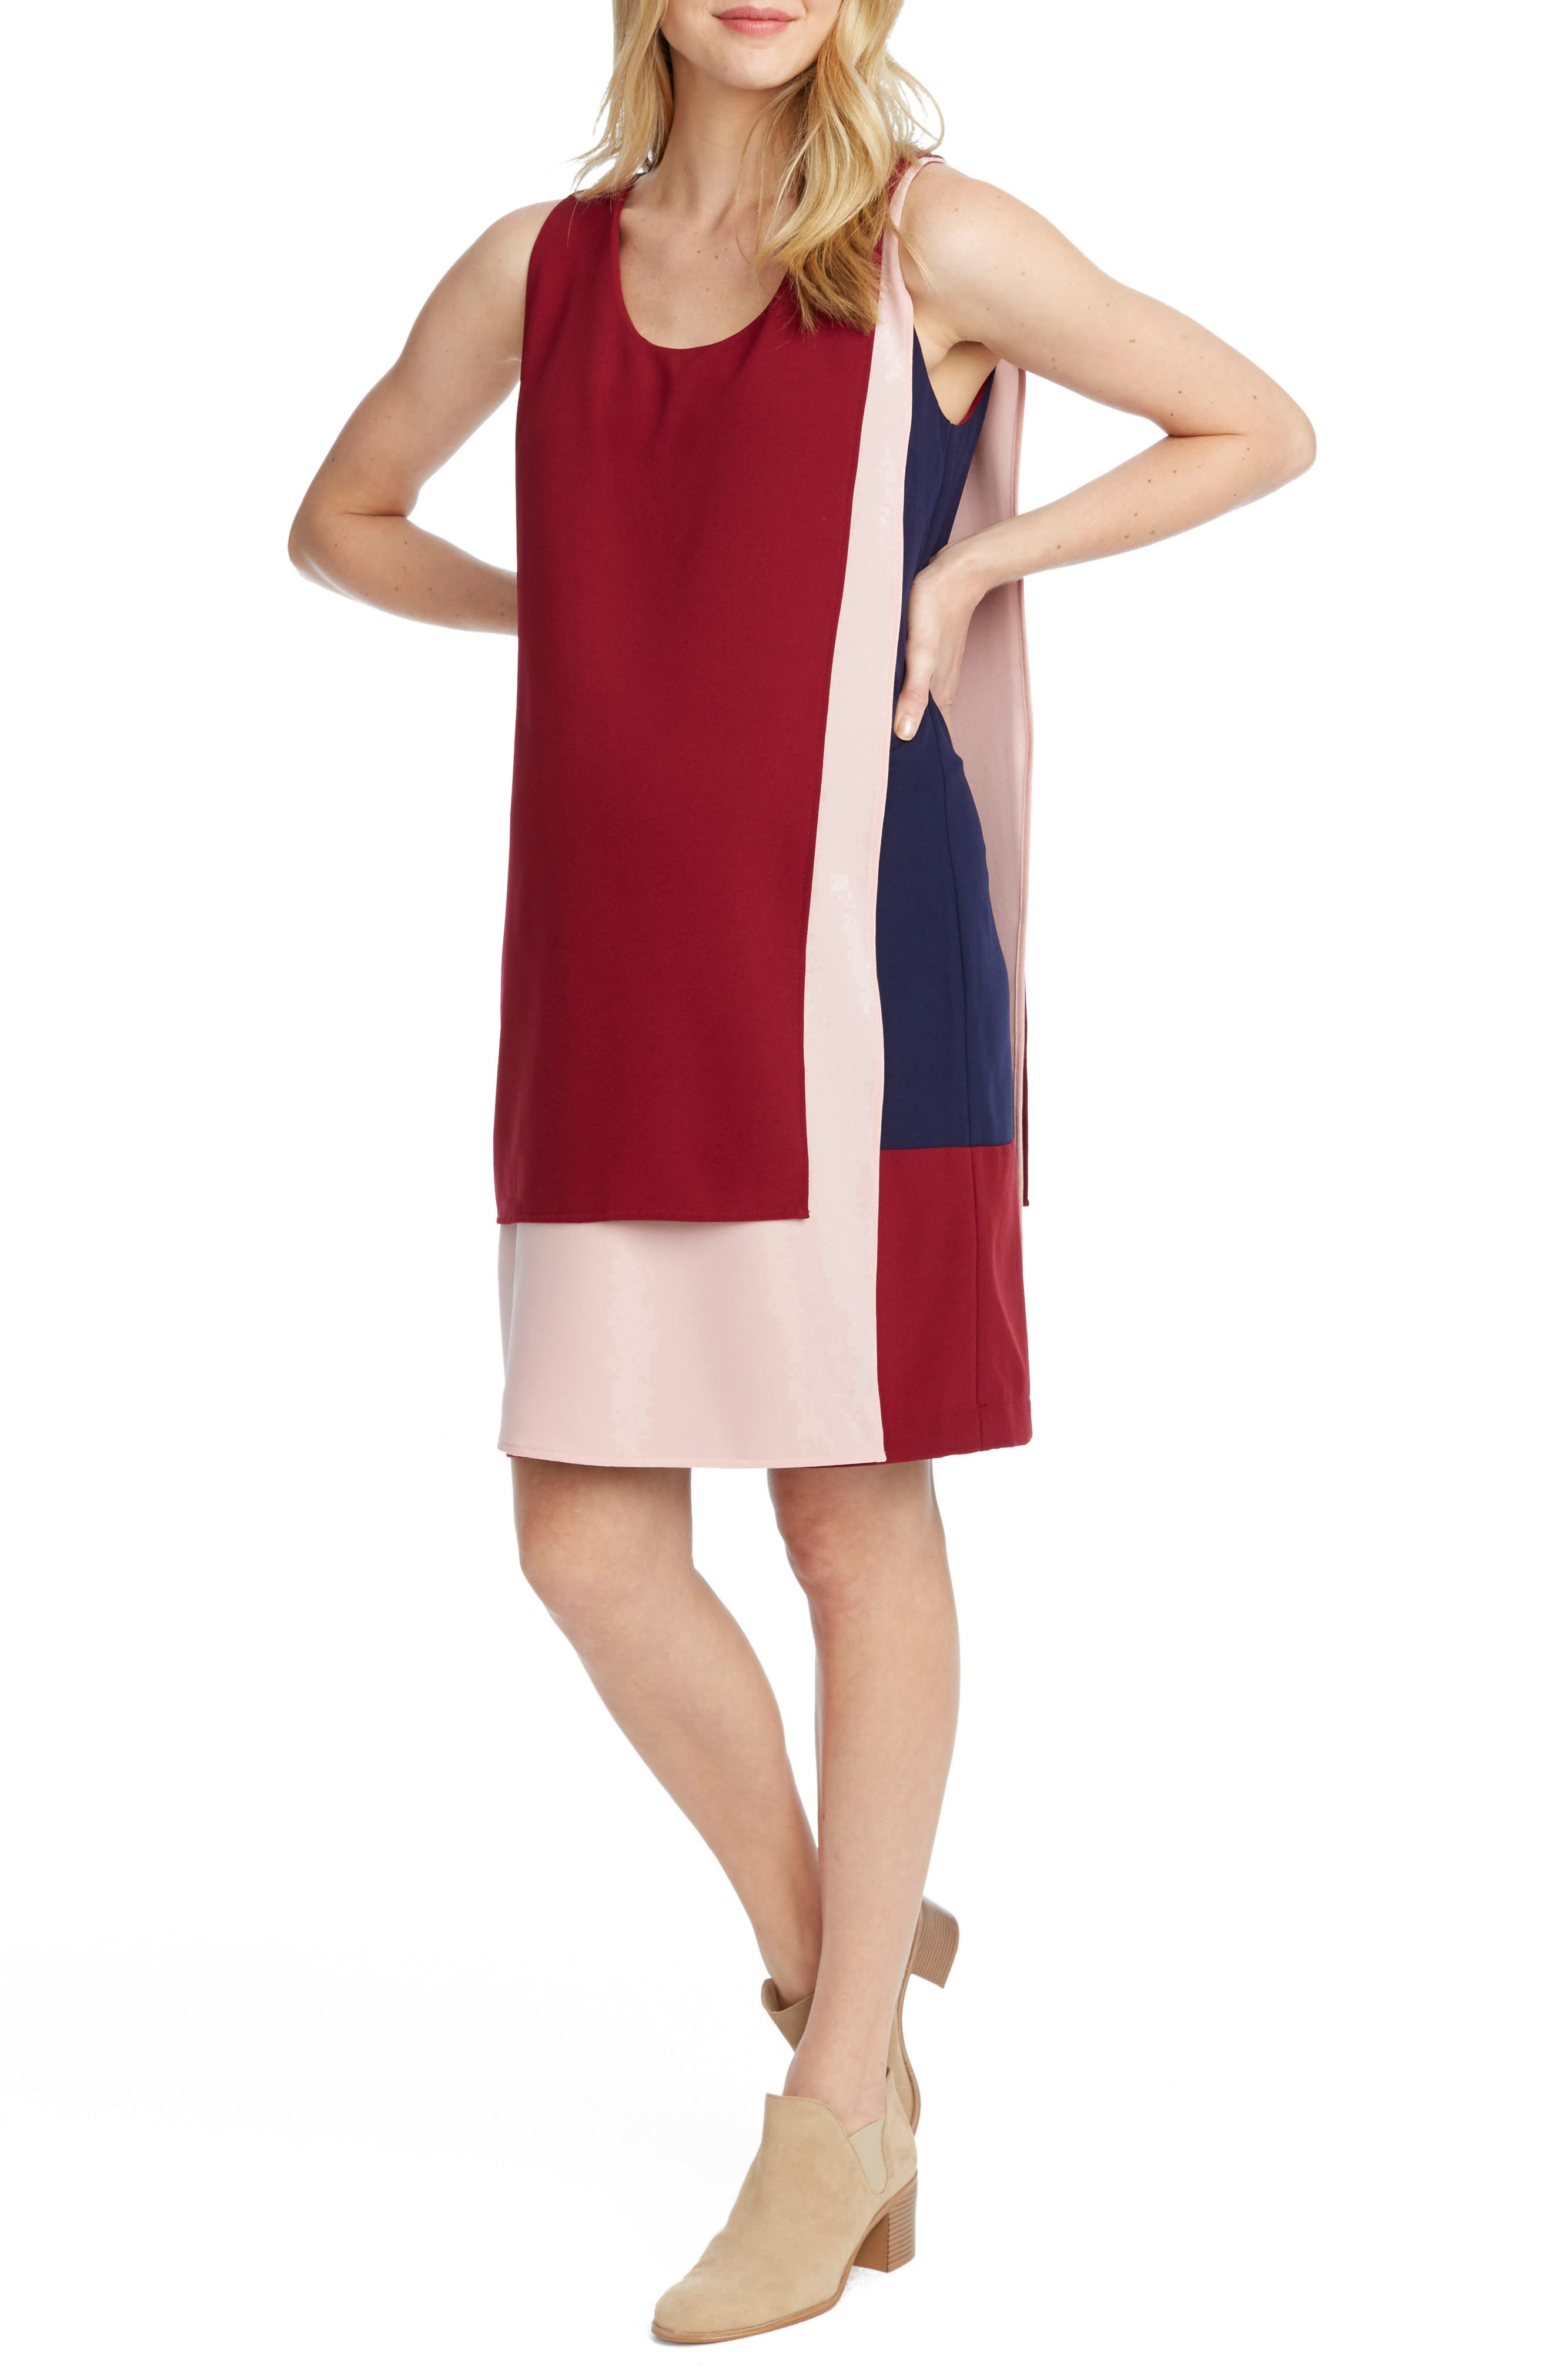 Rosie Pope Edina Maternity Shift Dress